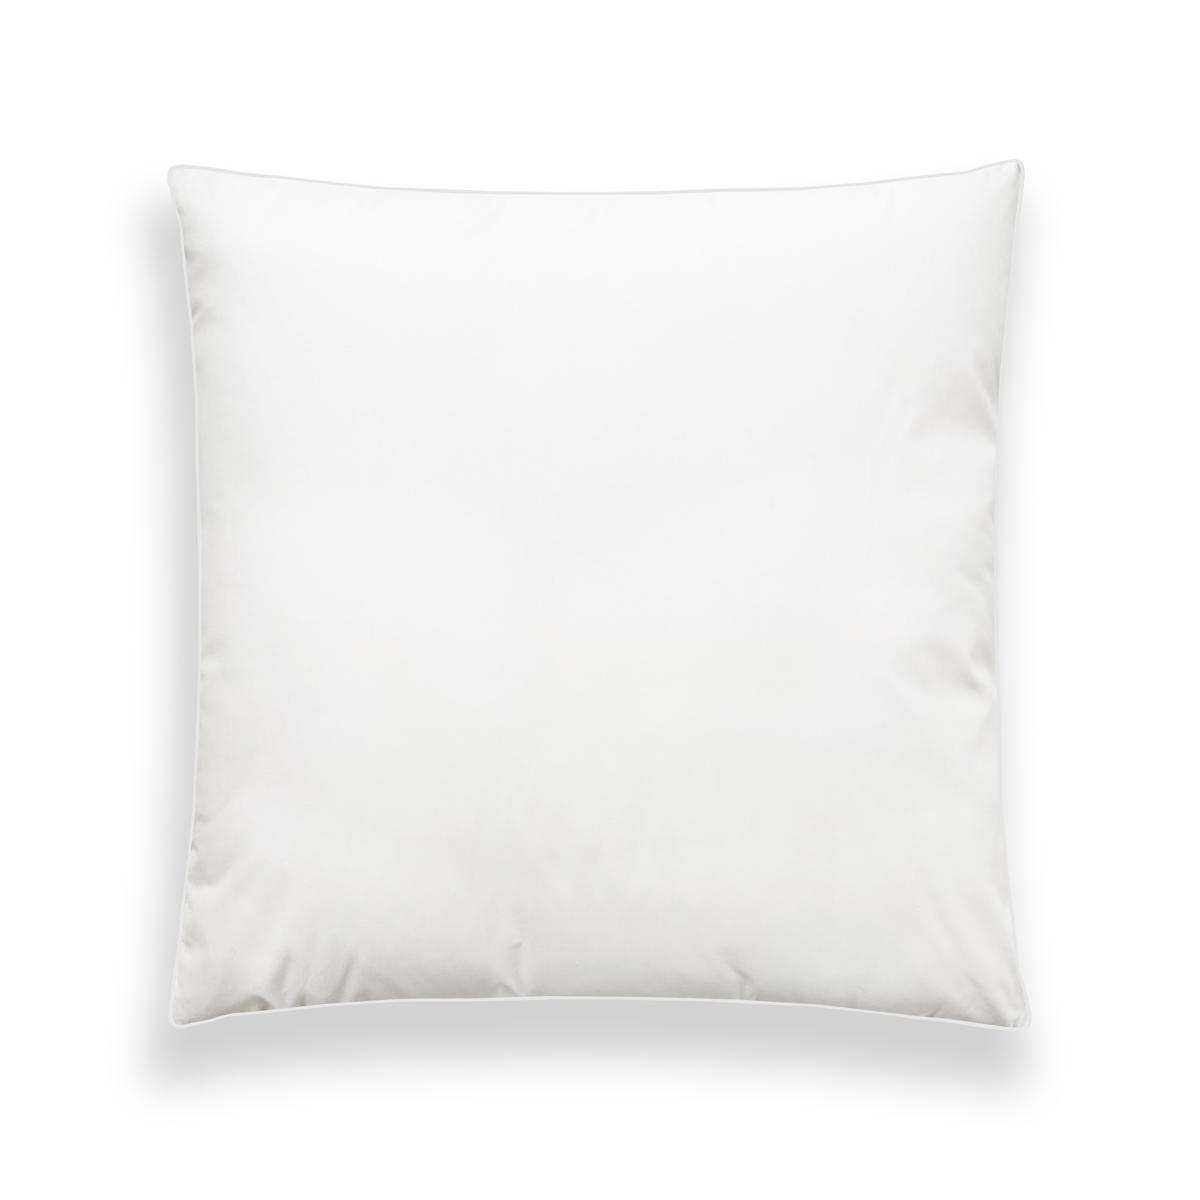 Oreiller FERME 10% Duvet - Coton Bio  50x75 cm